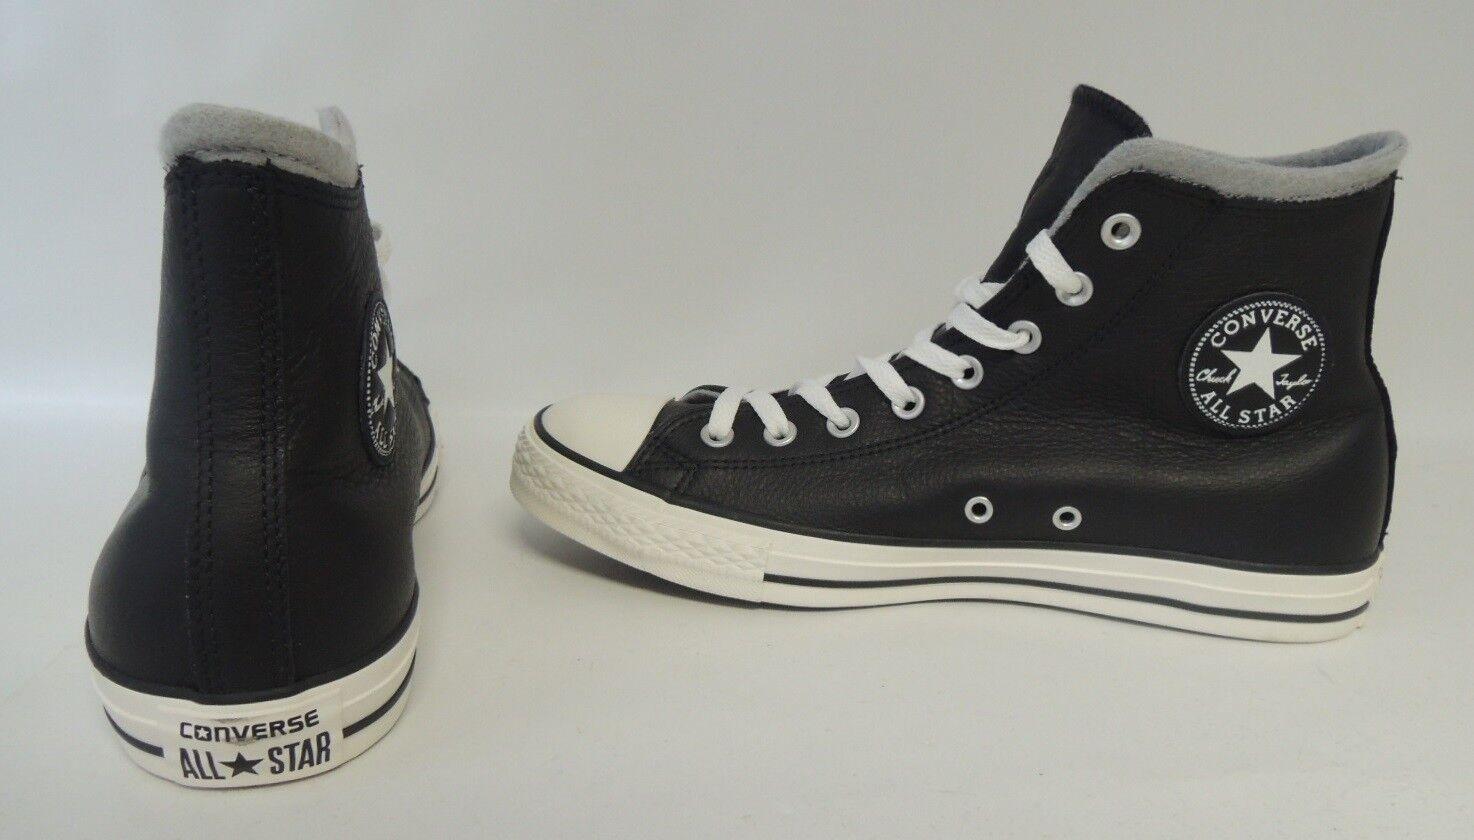 NEU  Schuhe Converse All Star Hi 41 Chuck Taylor Leder Sneaker Chucks 153820C